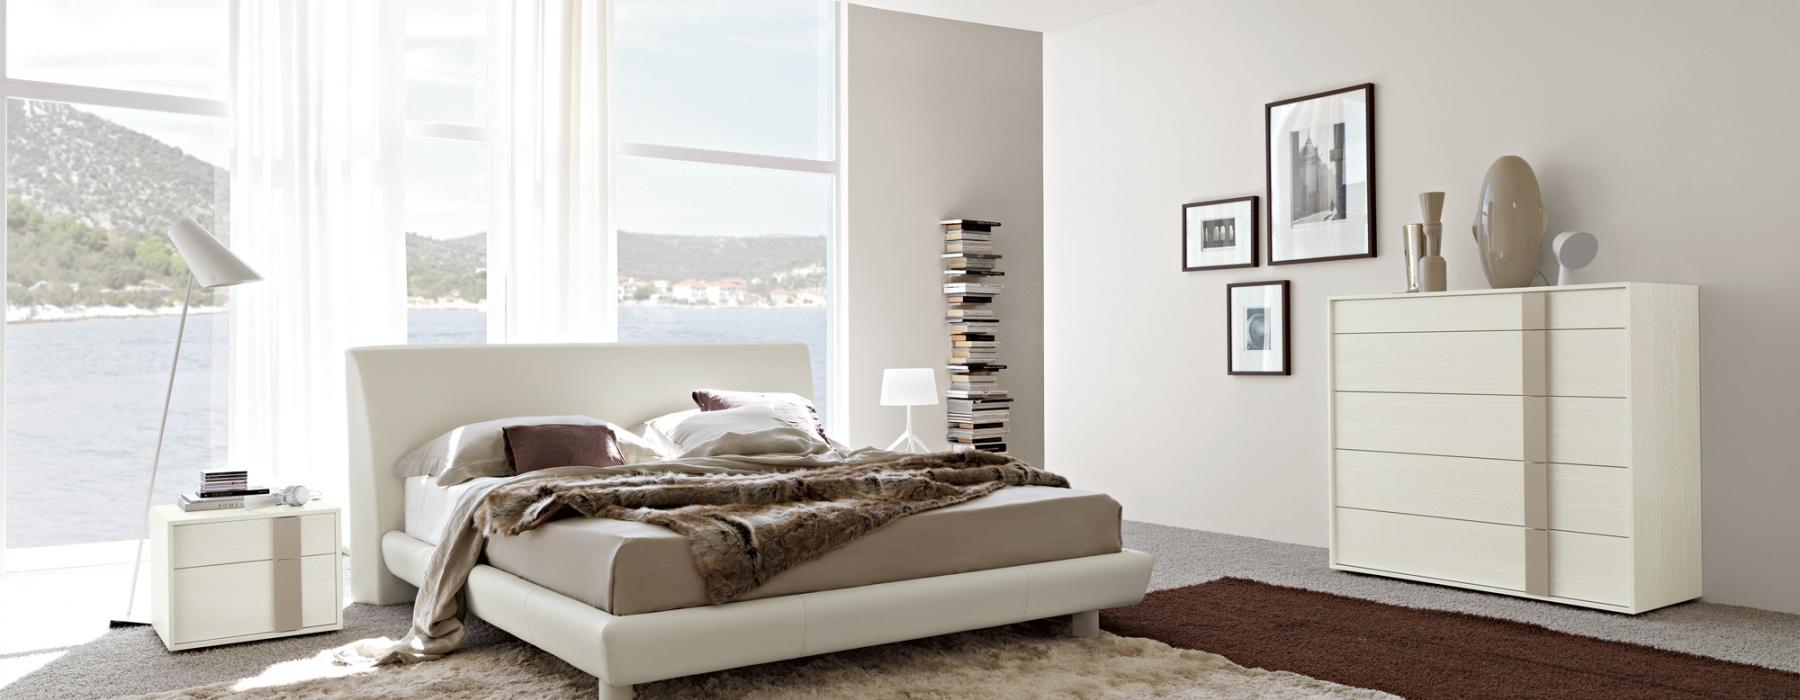 Camere febal catalogo 2014 1 design mon amour for Catalogo camere da letto moderne